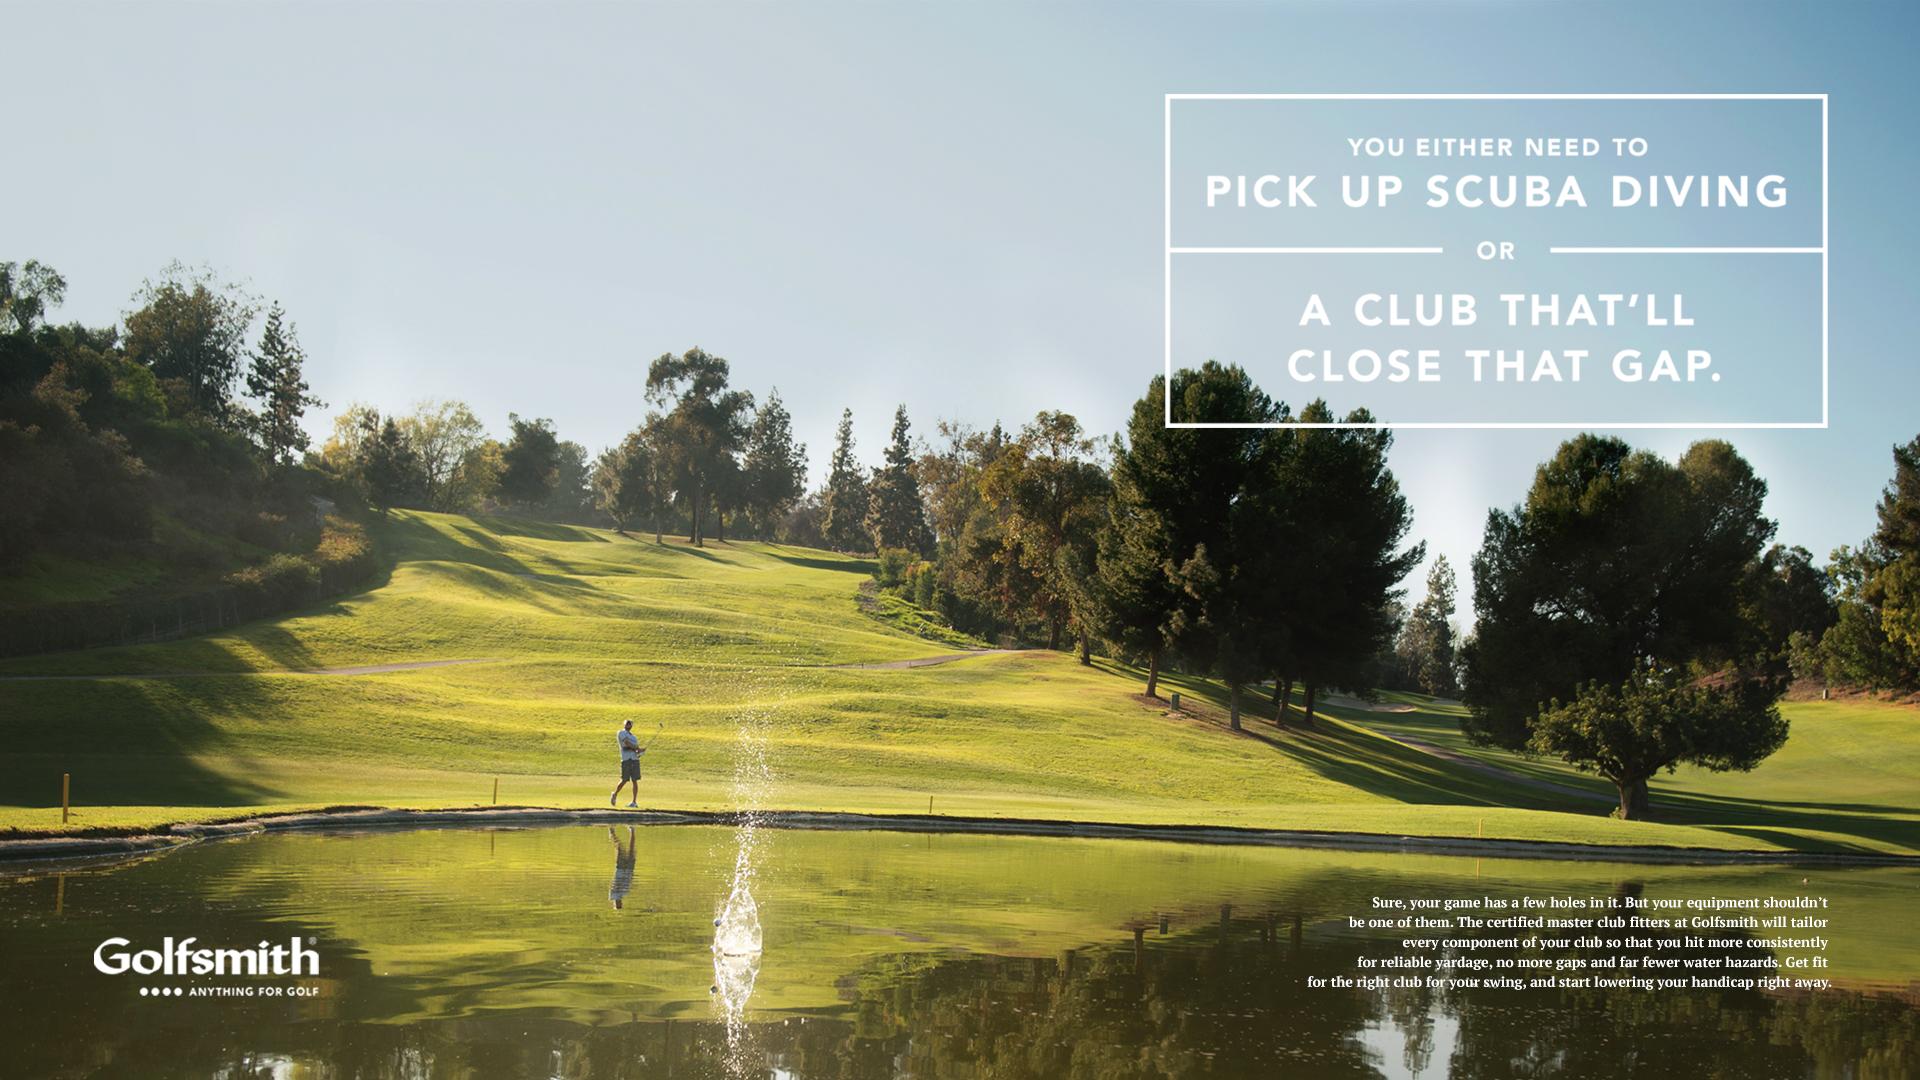 Golfsmith_Preacher_6 hi res.jpg